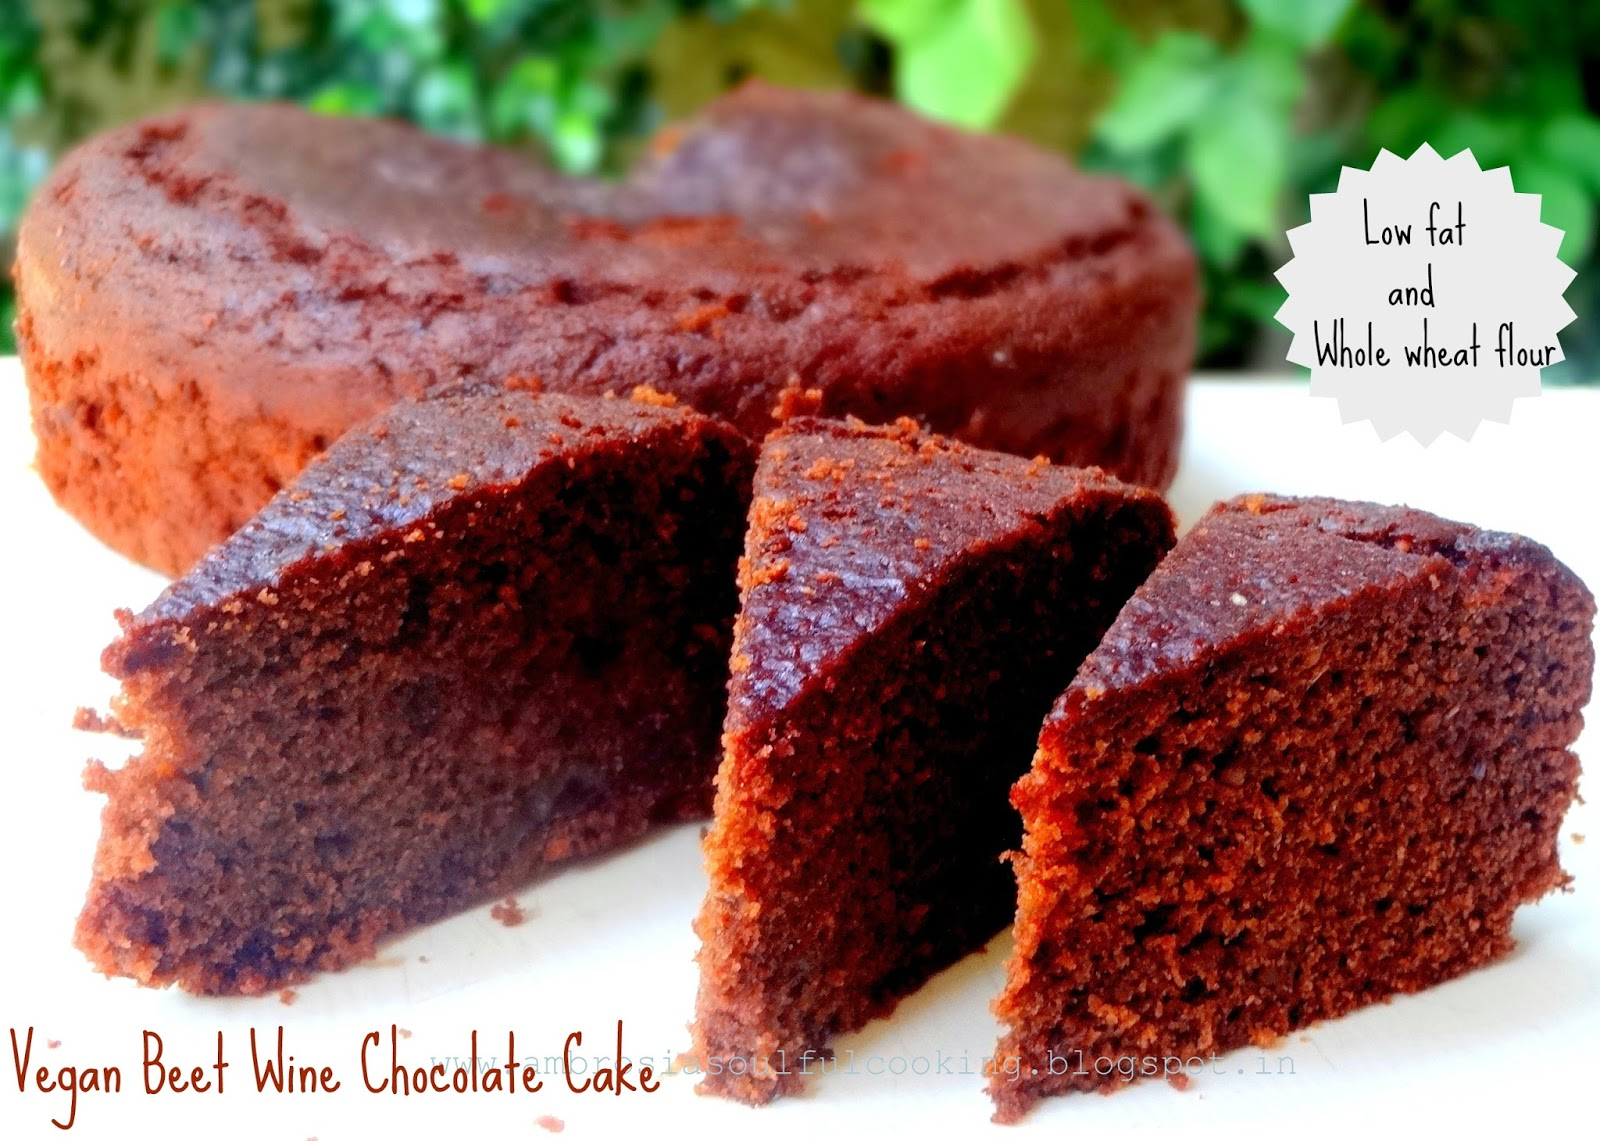 AMBROSIA: Vegan Beet Wine Chocolate Cake (Whole Wheat) | Vegan Baking